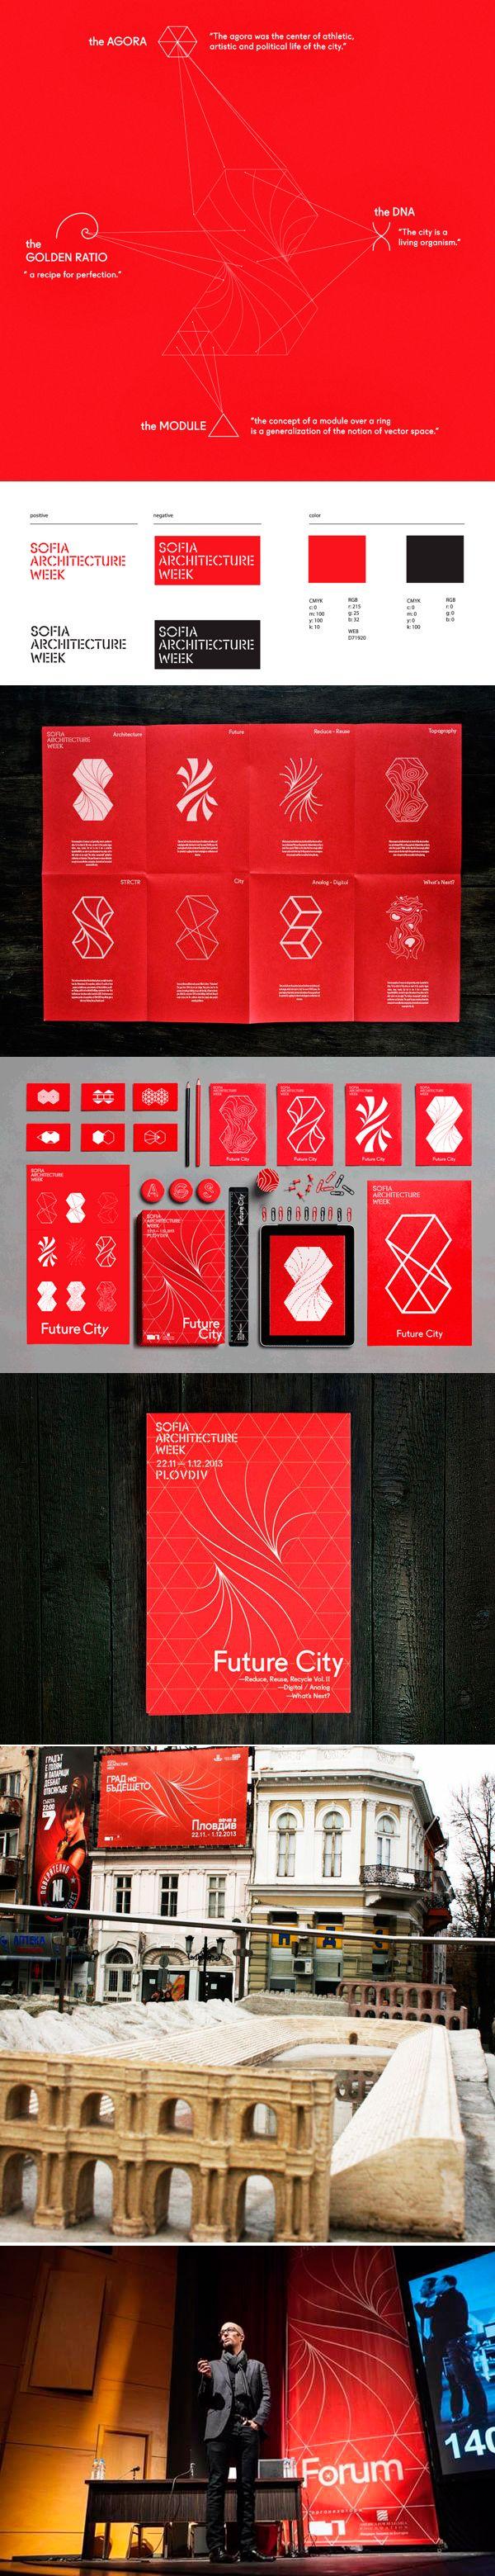 identity / Sofia Architecture Week 2014